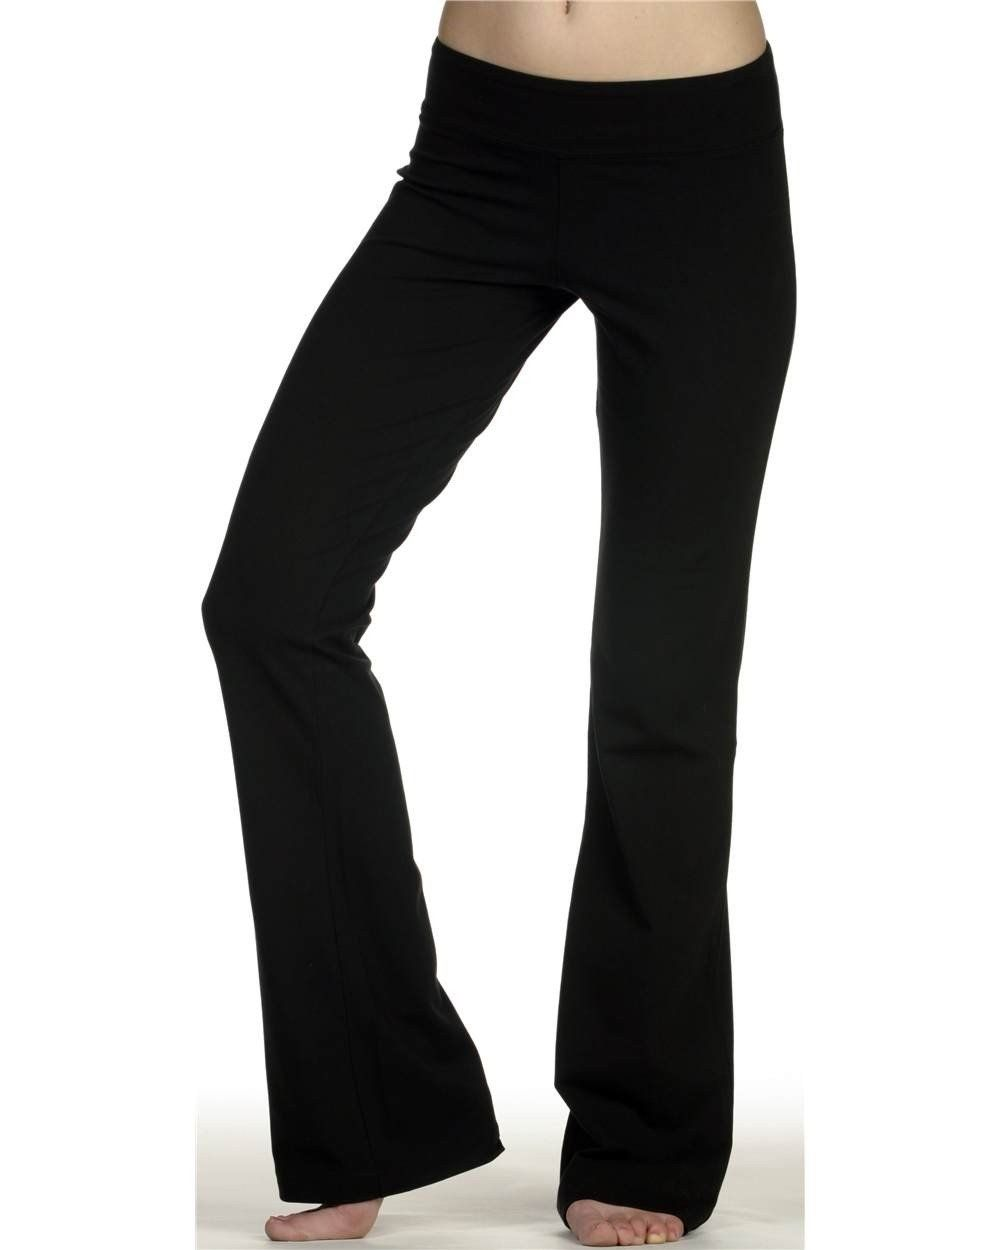 Amazon.com: Bella Ladies Cotton/Spandex Fitness Yoga Pants: Clothing -- Goal #2 treat: better workout clothes!